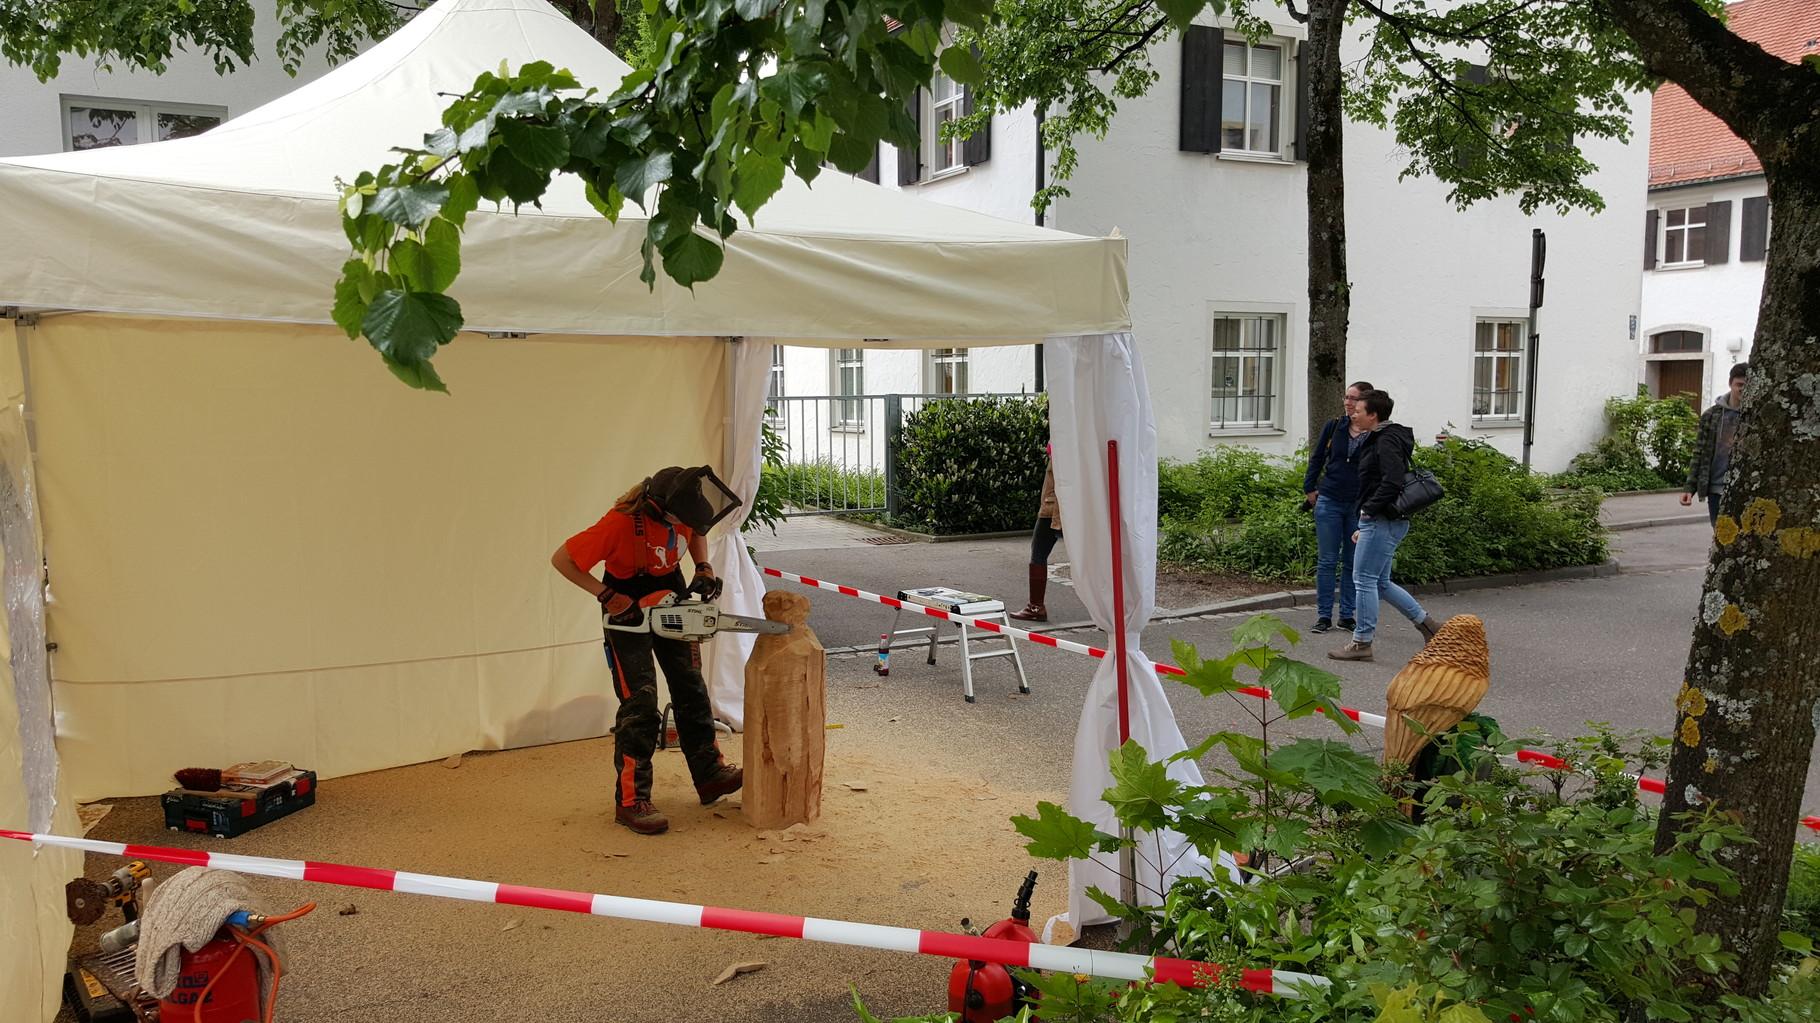 Museumstag Kempten - Schnitzen mit der Kettensäge - Allgäu-Carving by Martina Gast